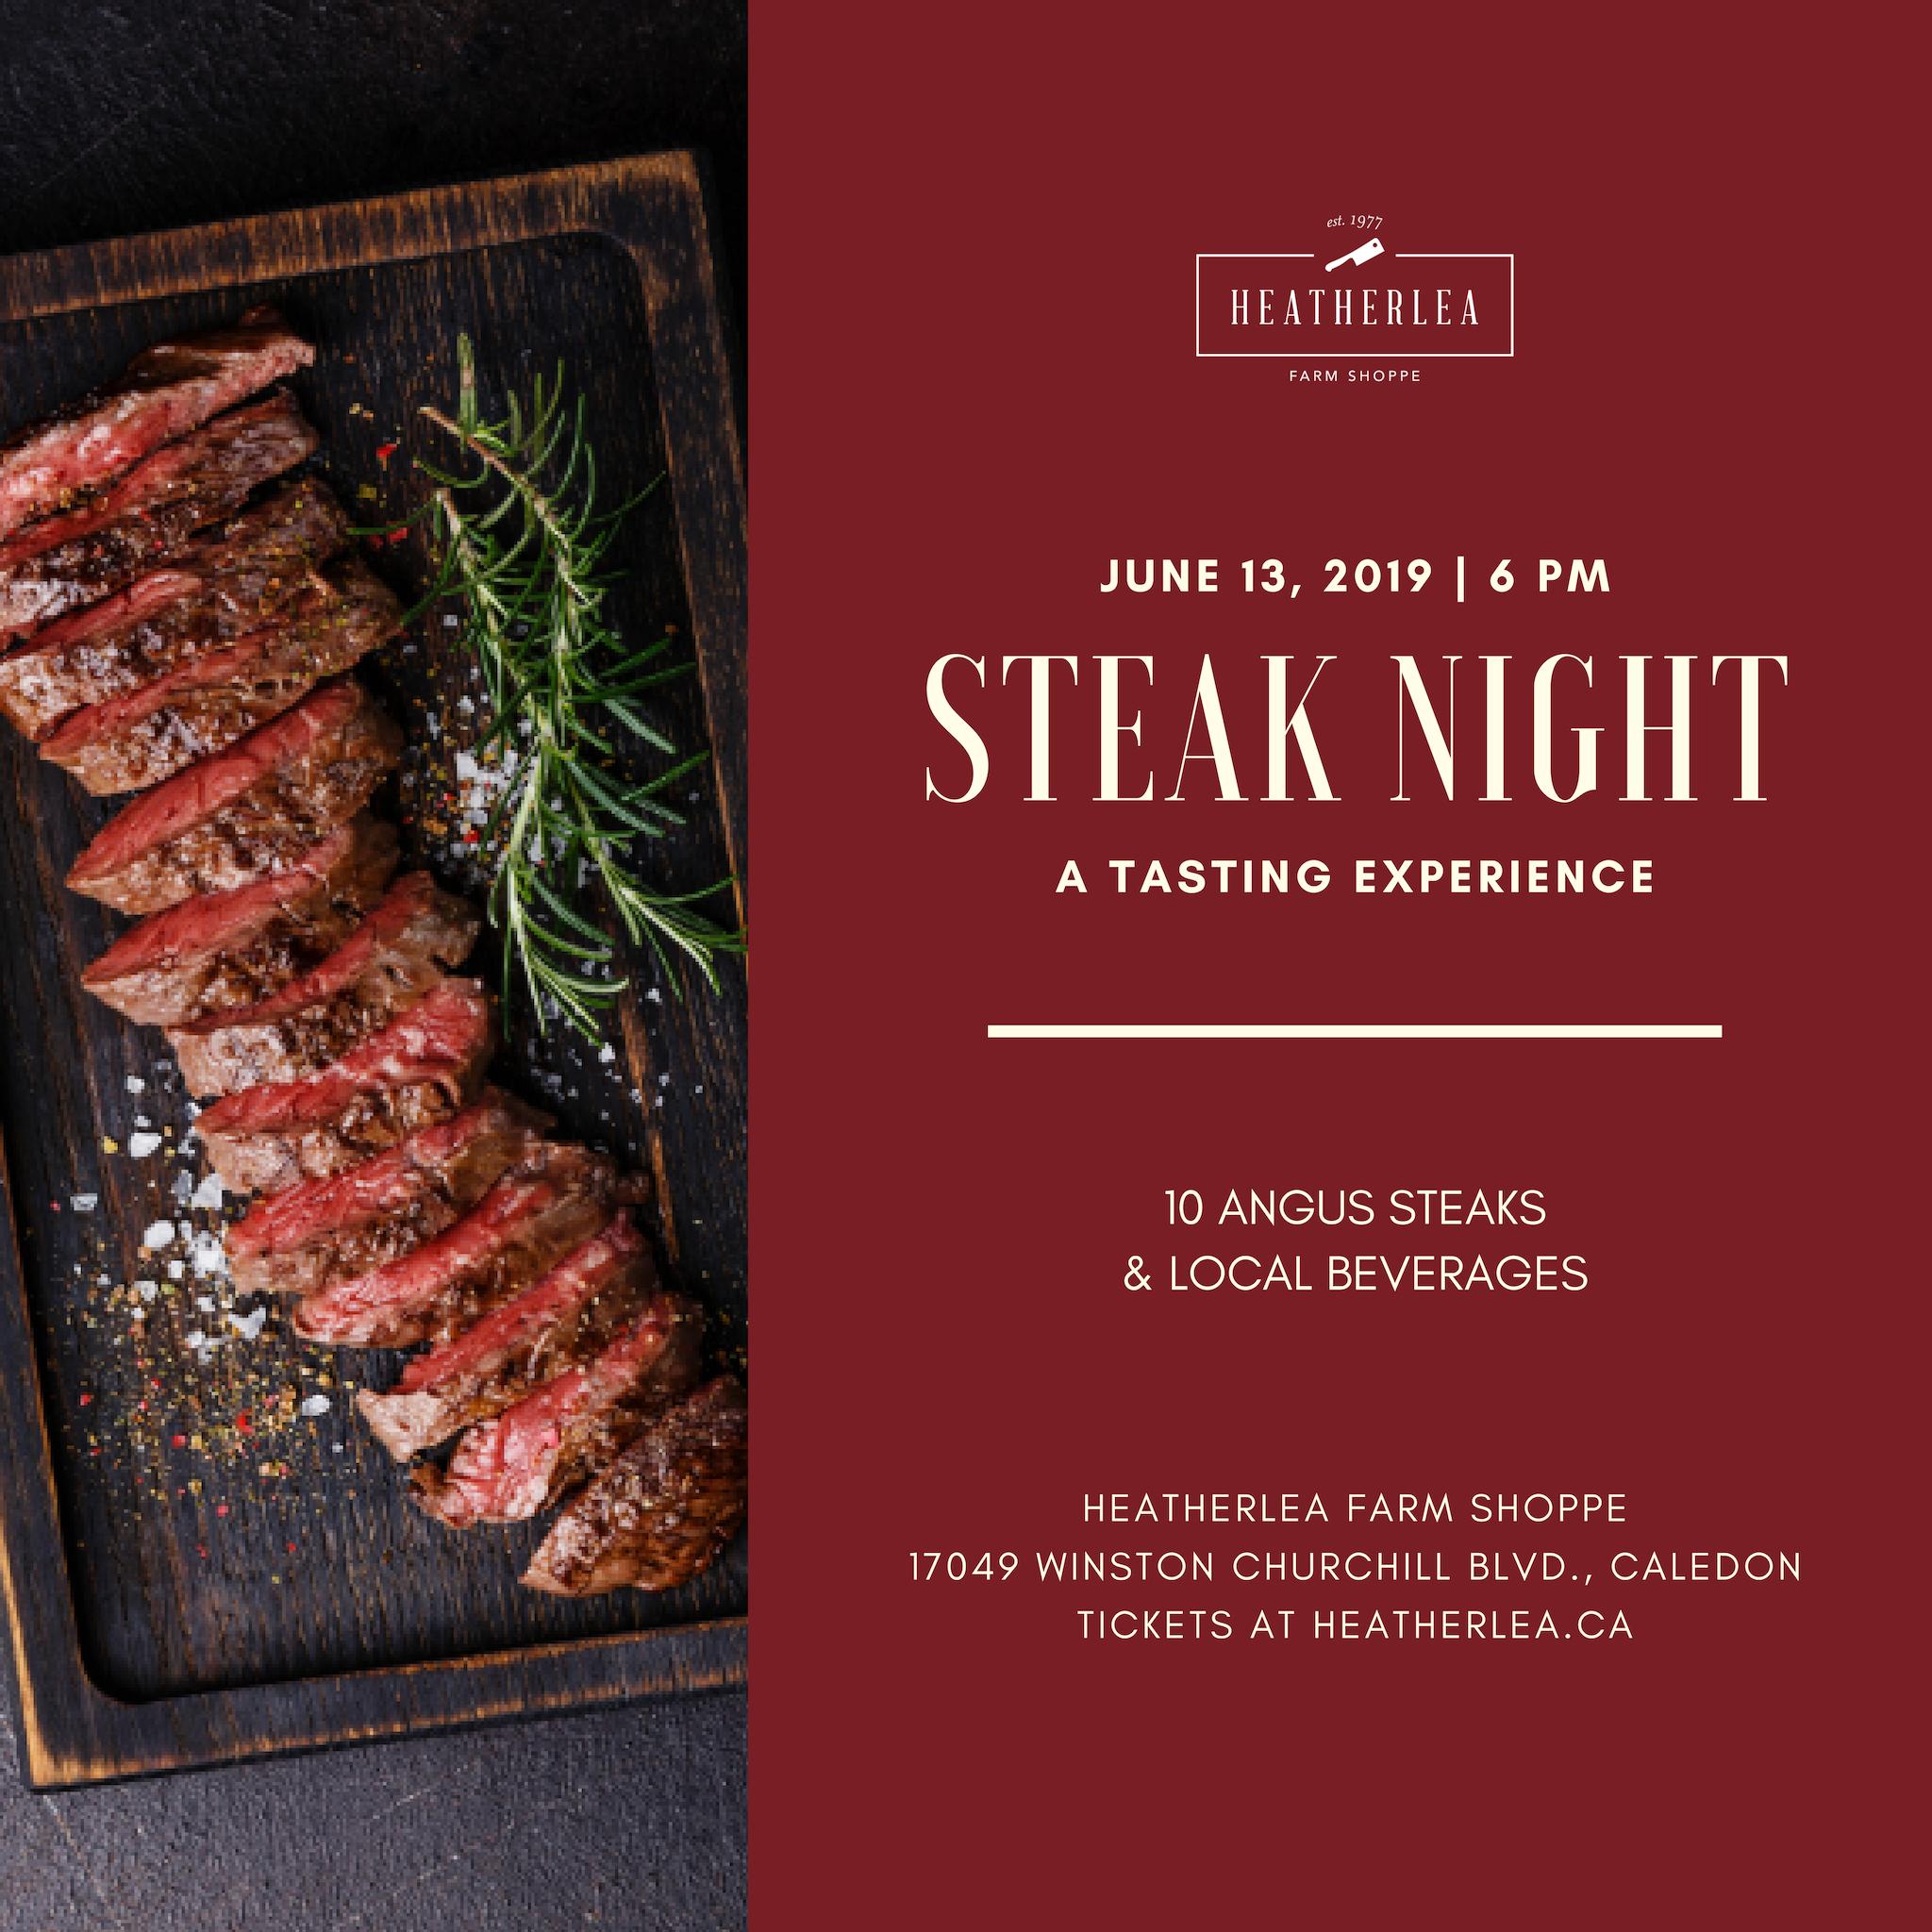 Steak Night: A Tasting Experience